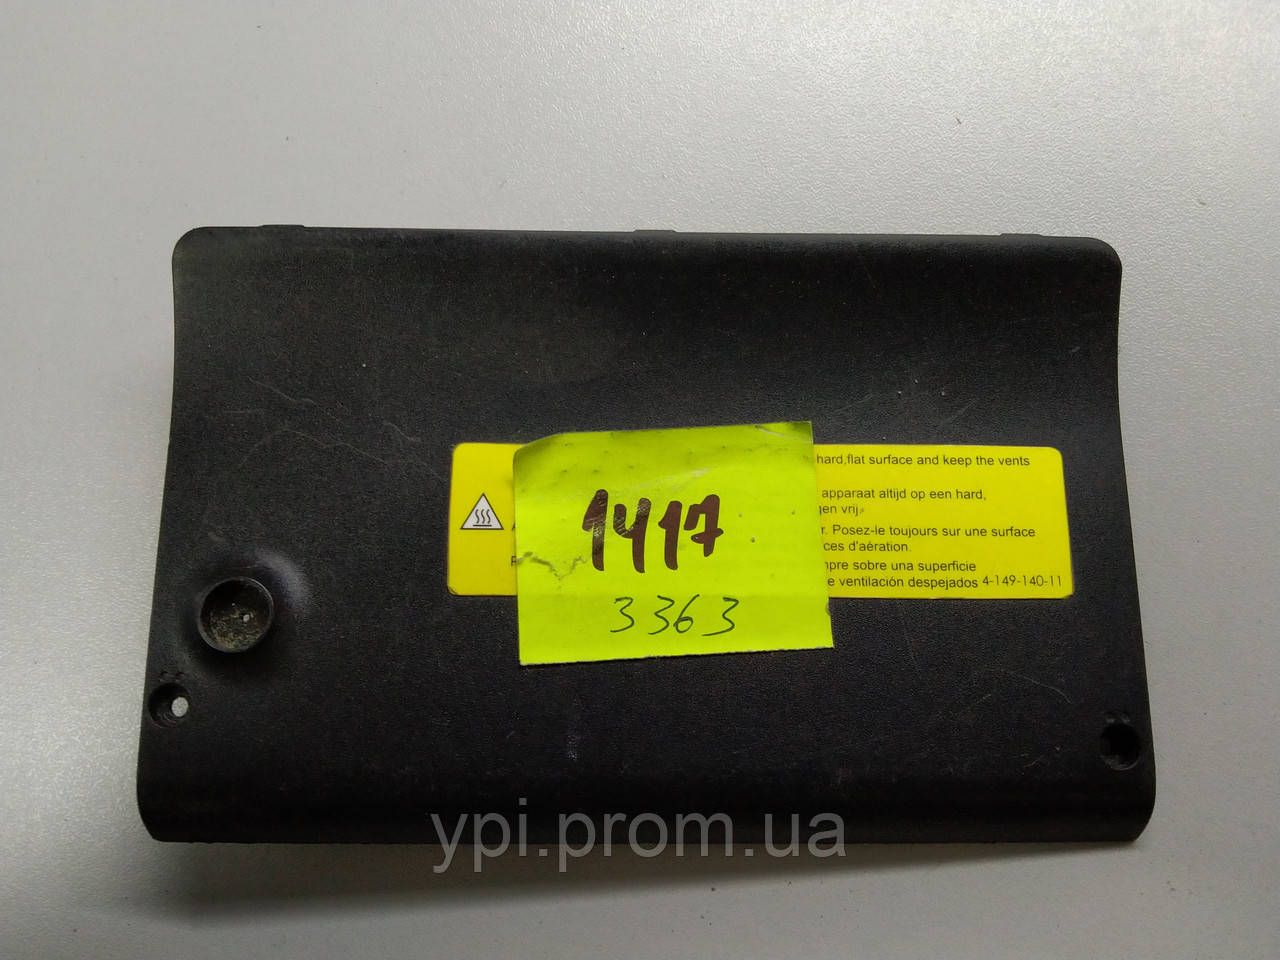 Cервисная крышка для ноутбука Sony PCG 7451M